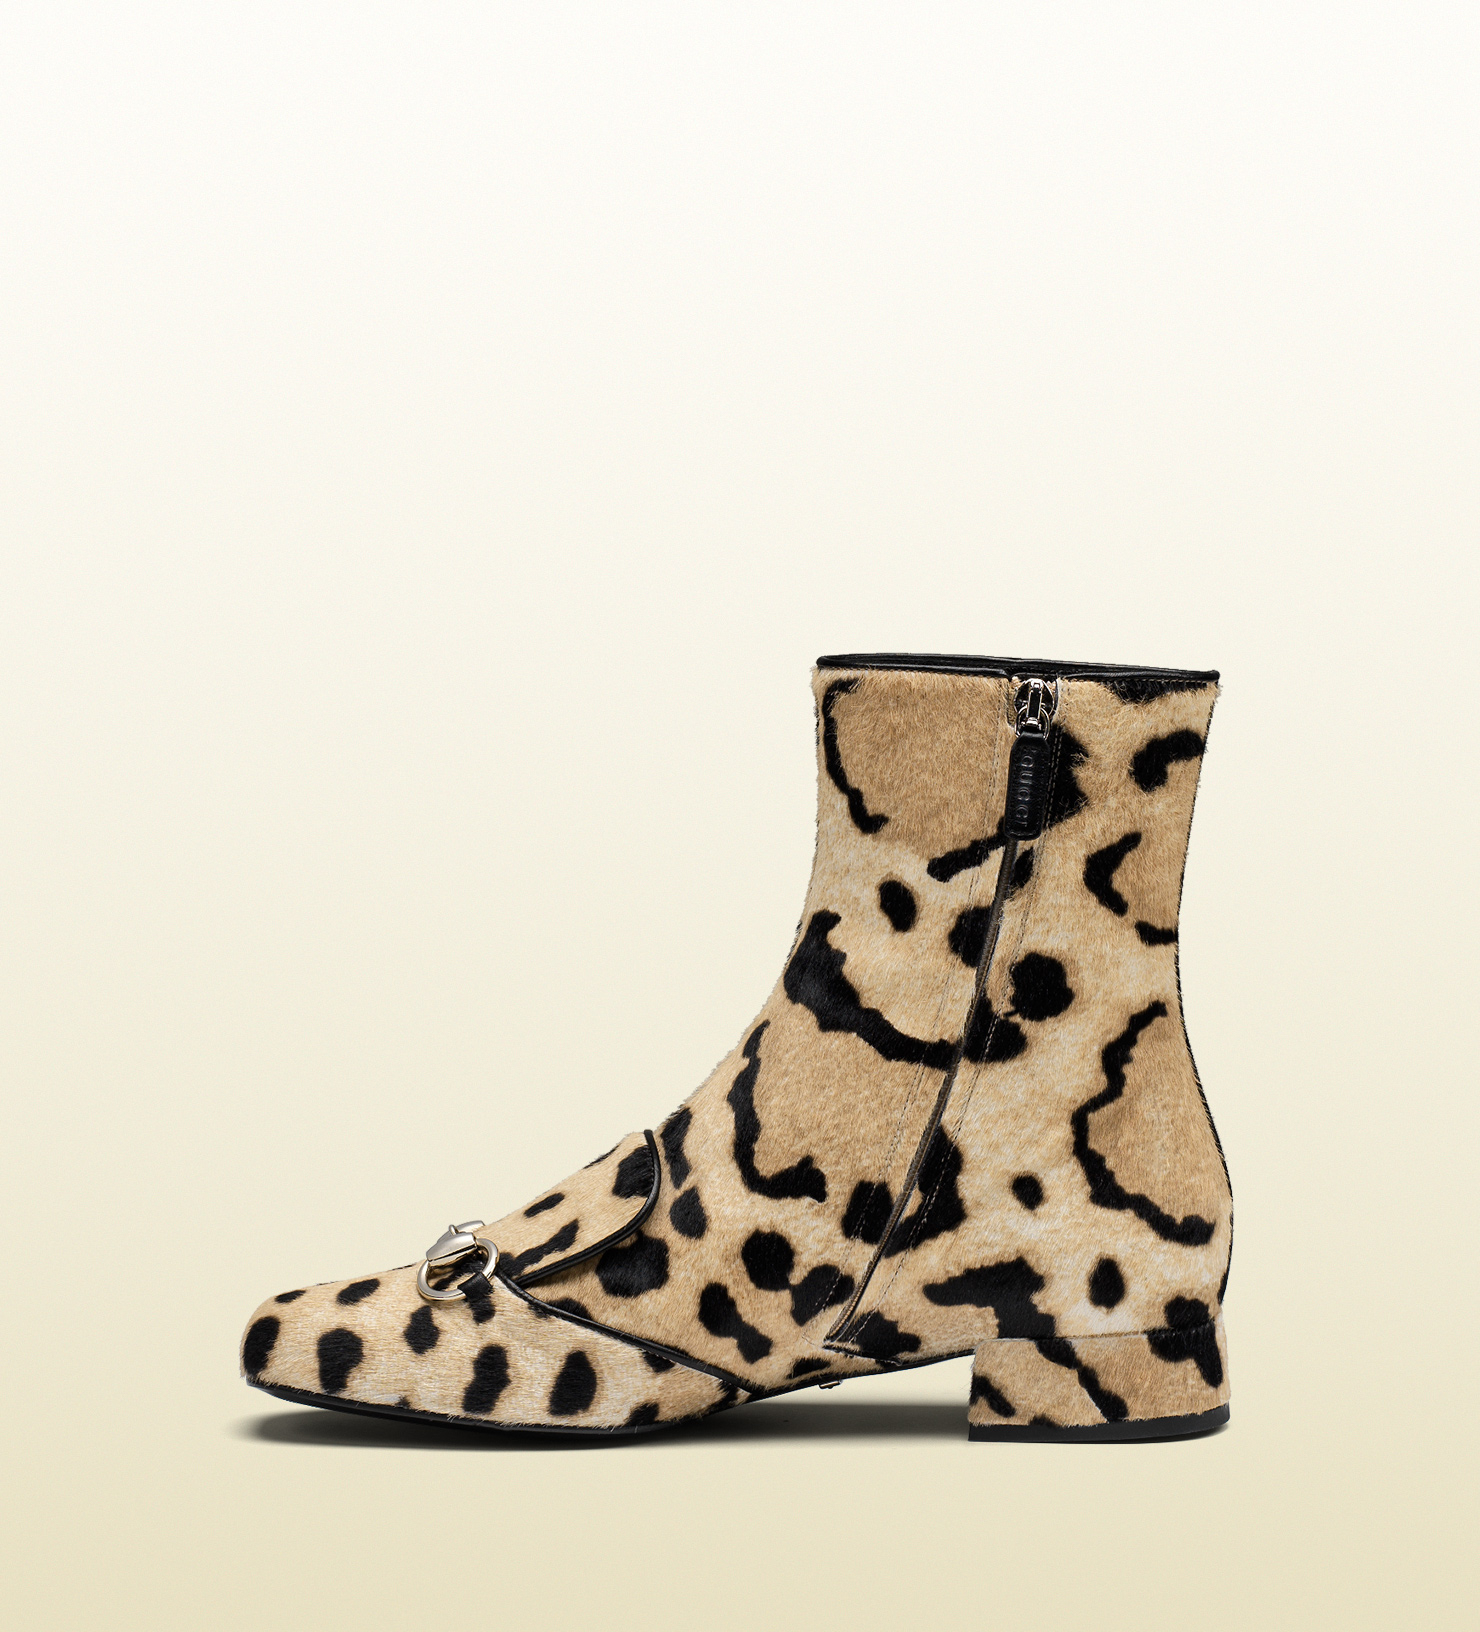 a42e24c01f34 Gucci Leopard Print Calf Hair Horsebit Ankle Boot - Lyst